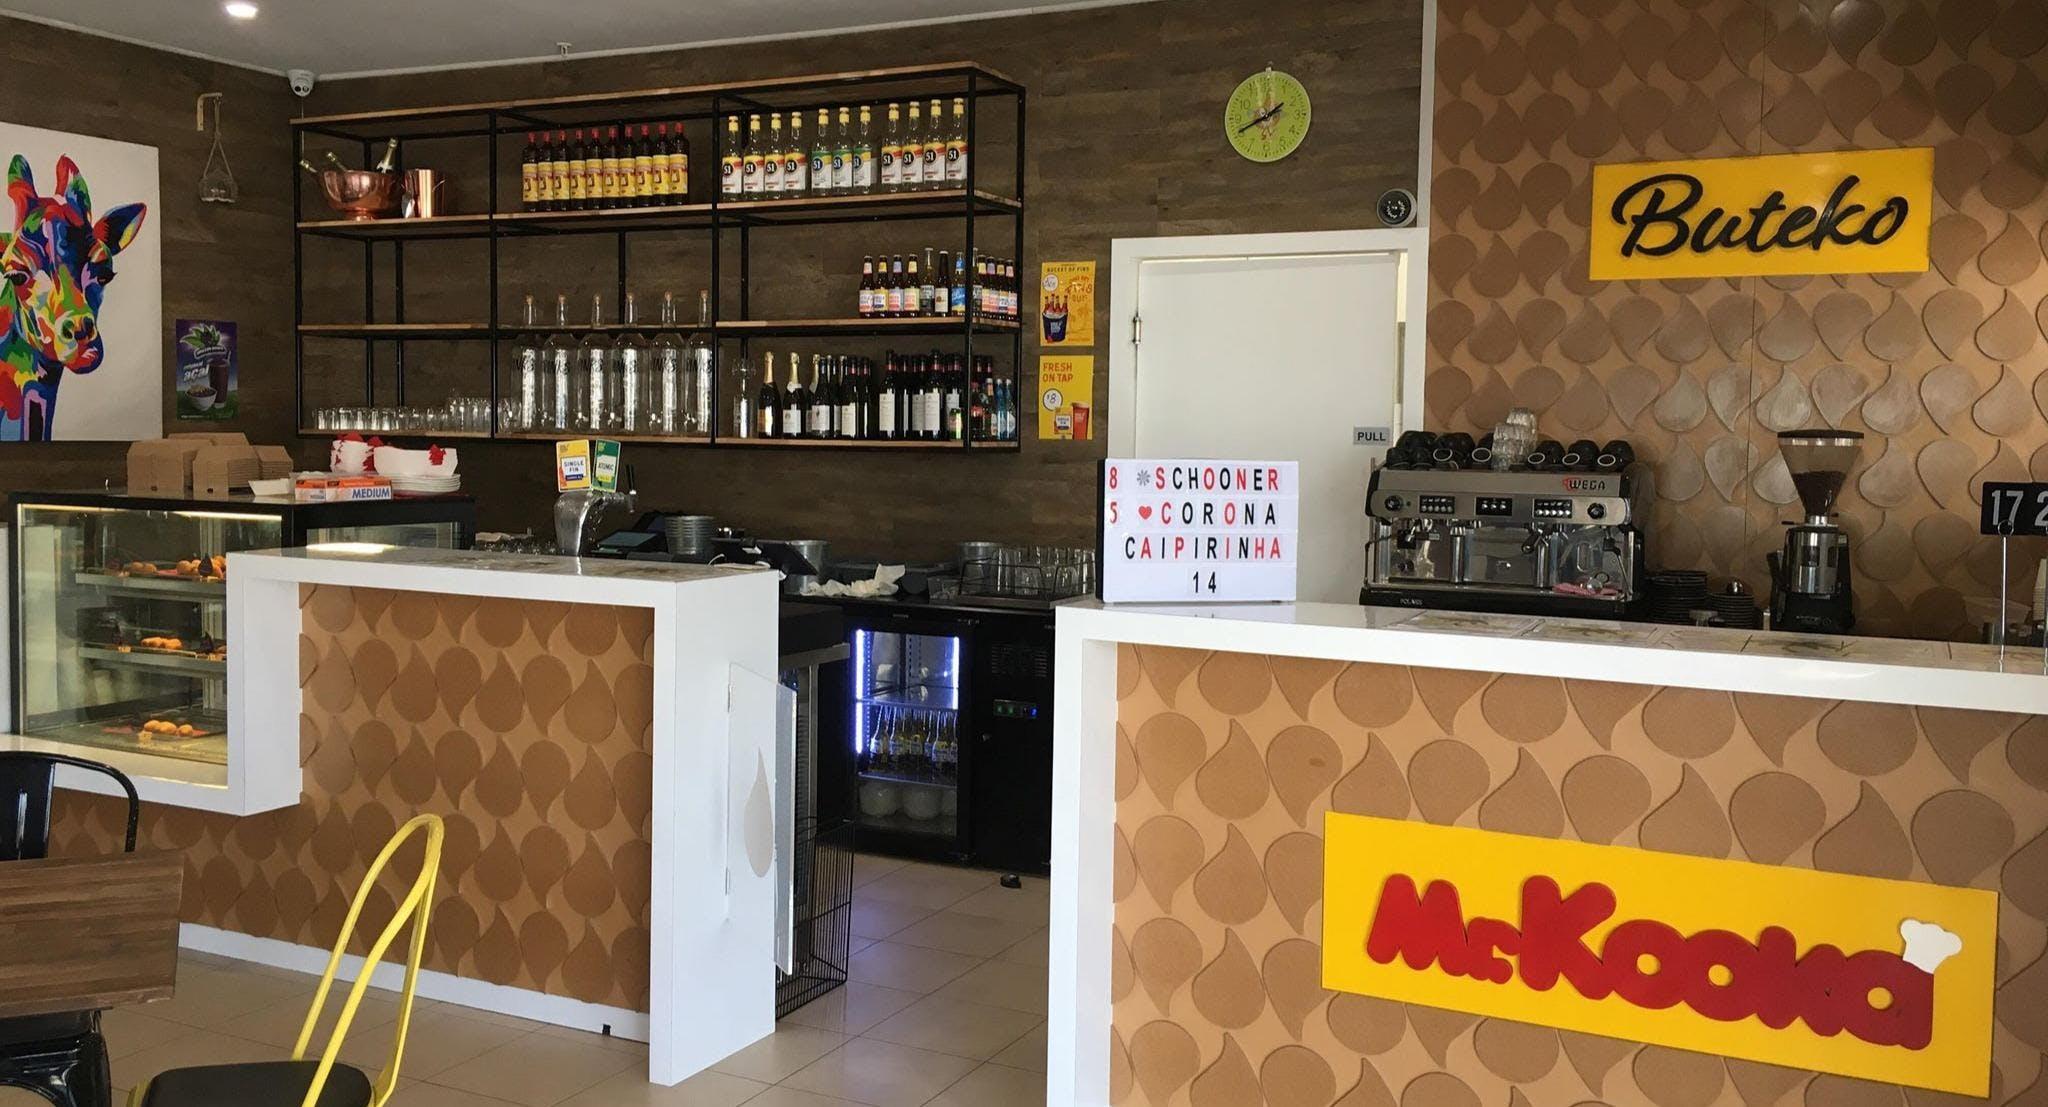 Buteko - Brazilian Bar and Restaurant